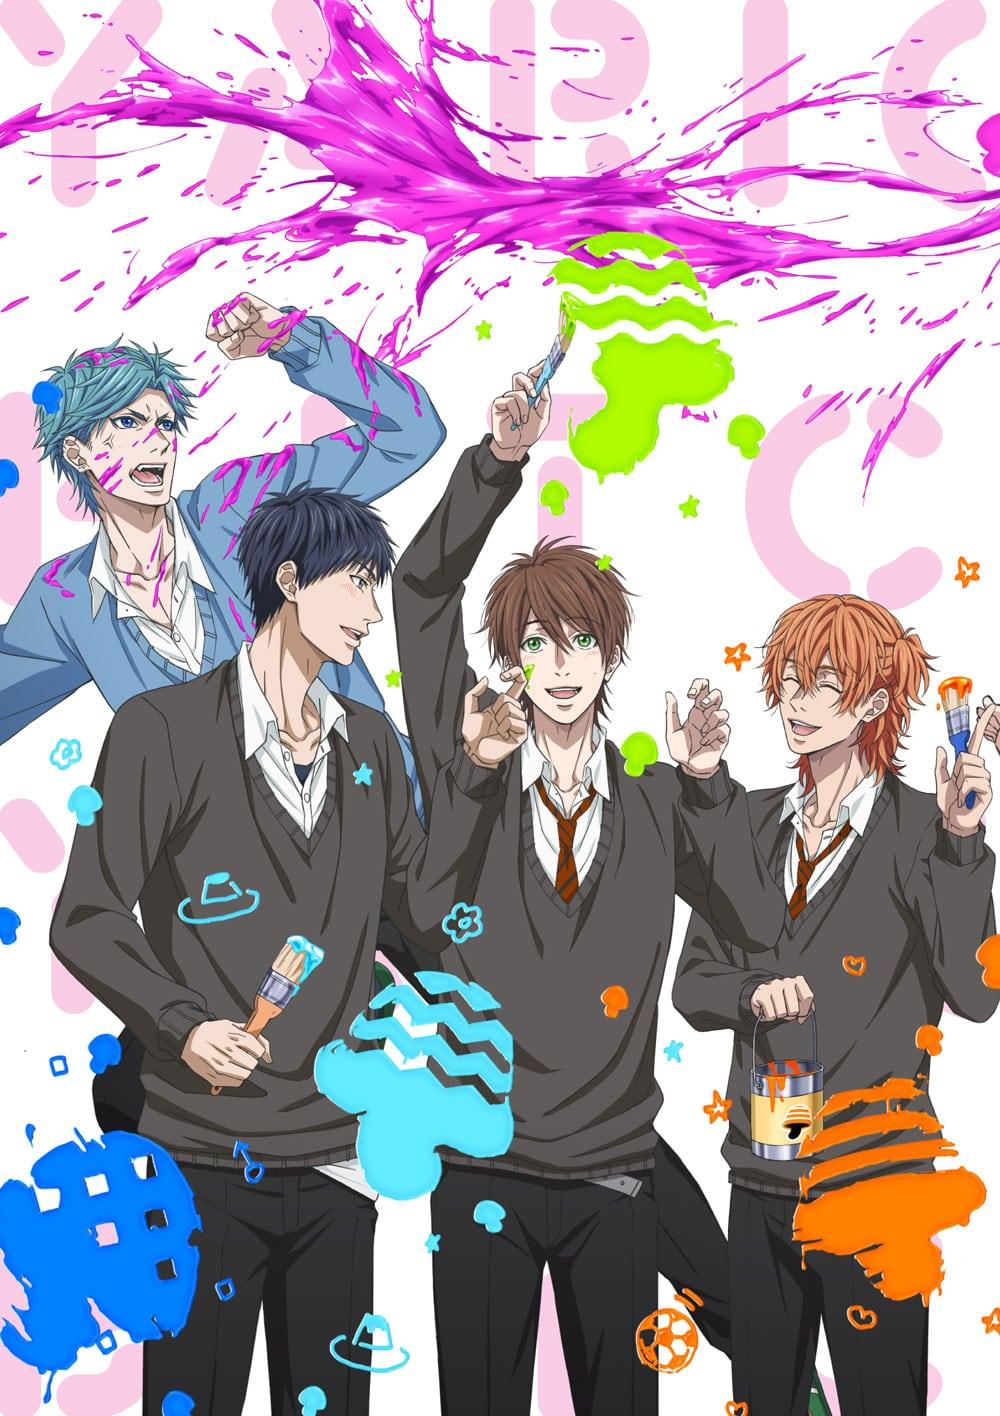 【WEB予約分】「ヤリチン☆ビッチ部」モリモーリ版 DVD